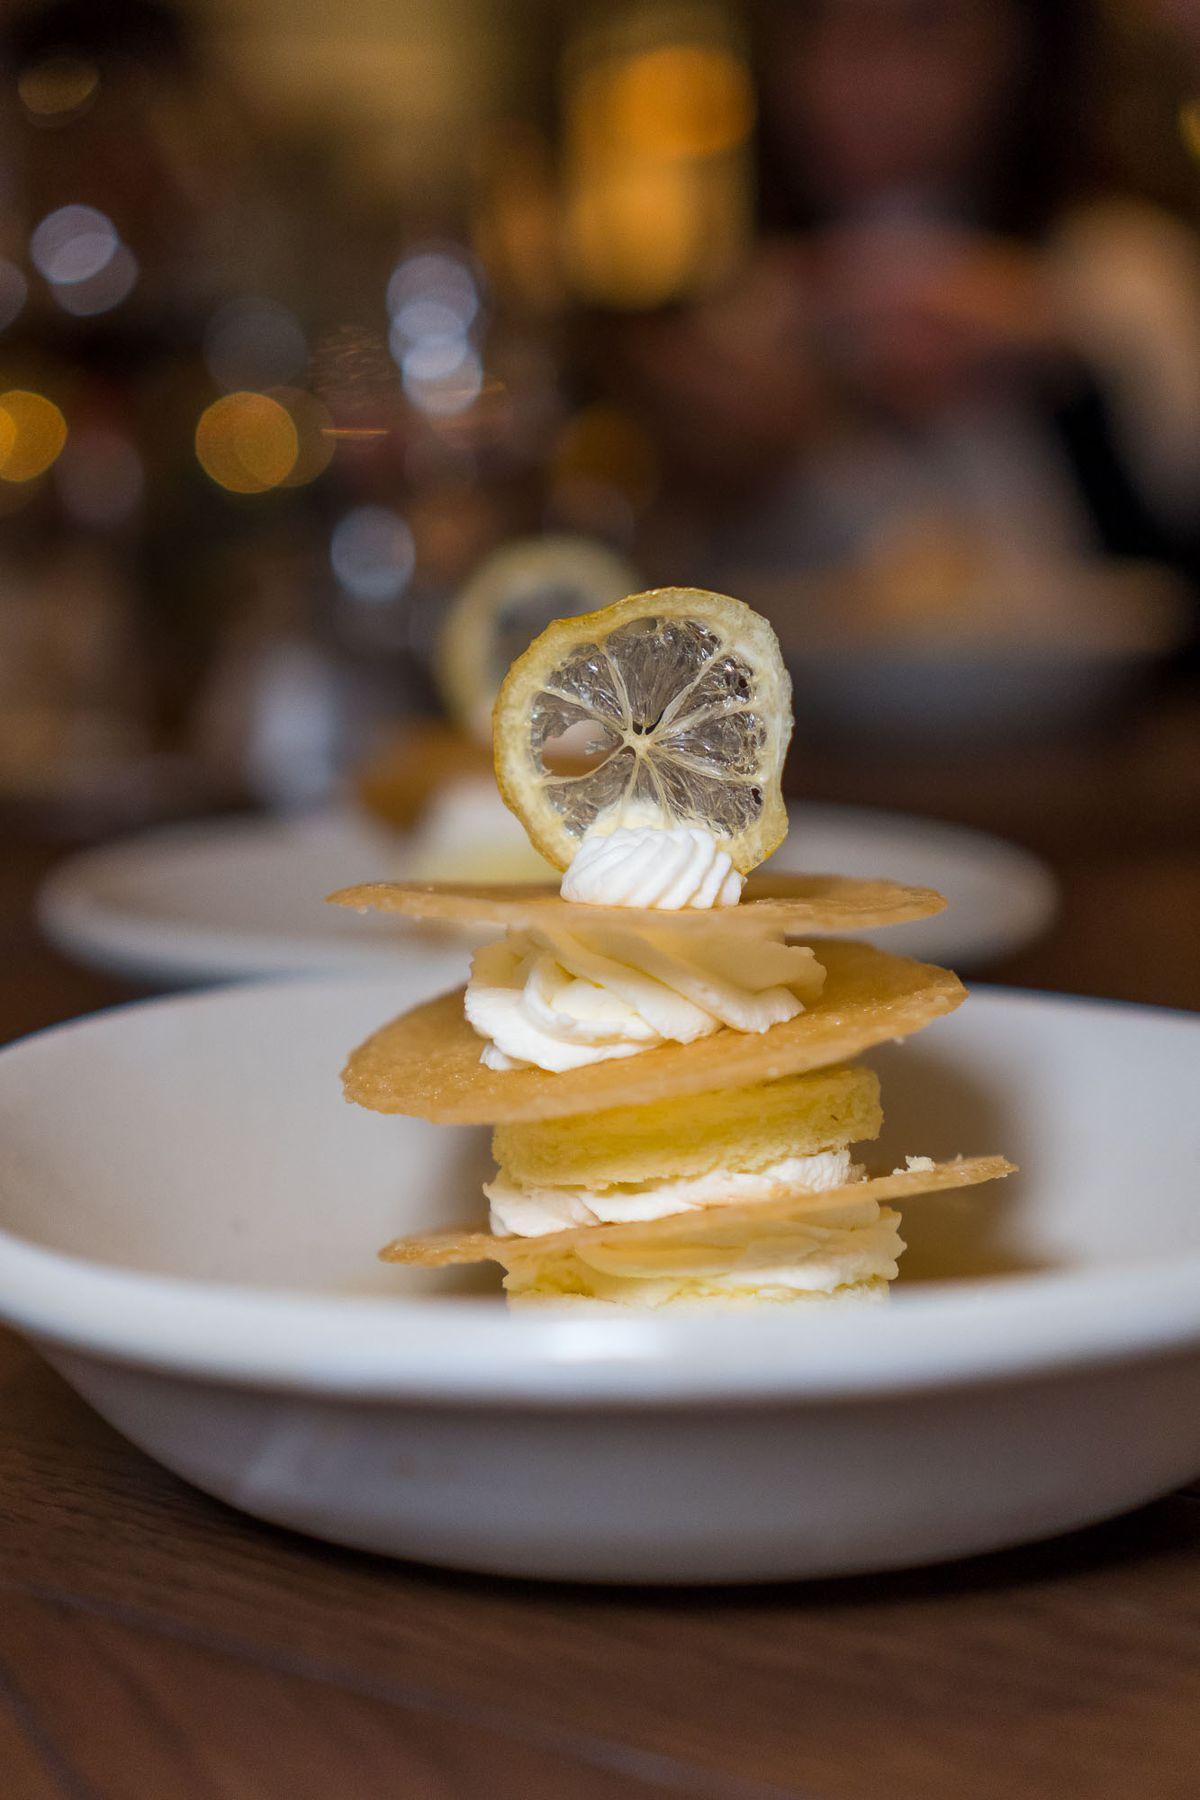 Millefoglie al limone at Manzo